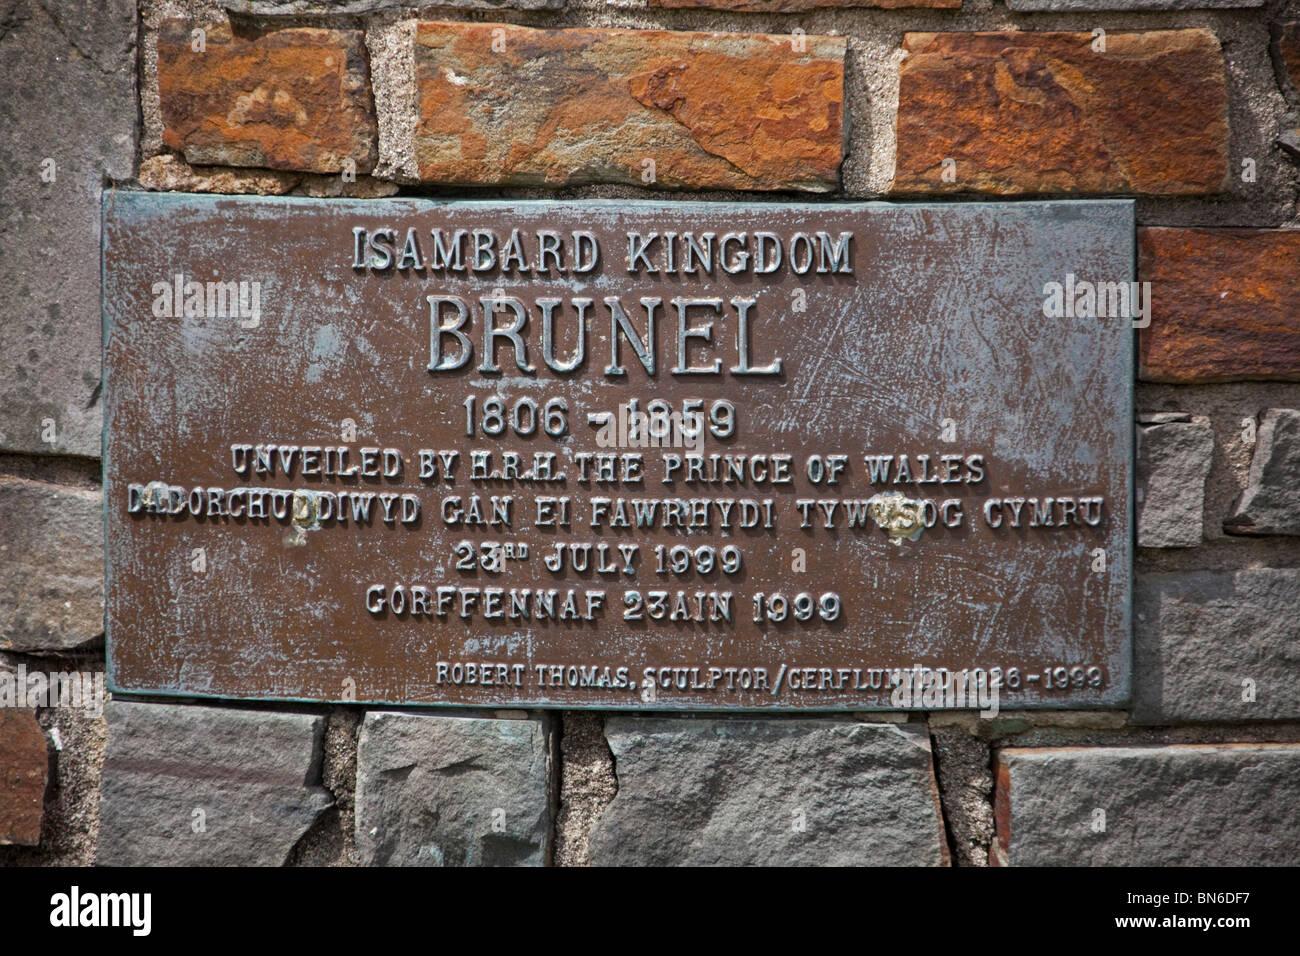 Commemorative plaque of Isambard Kingdom Brunel, on statue at Neyland, Pembrokeshire Wales 107624 Brunel Stock Photo